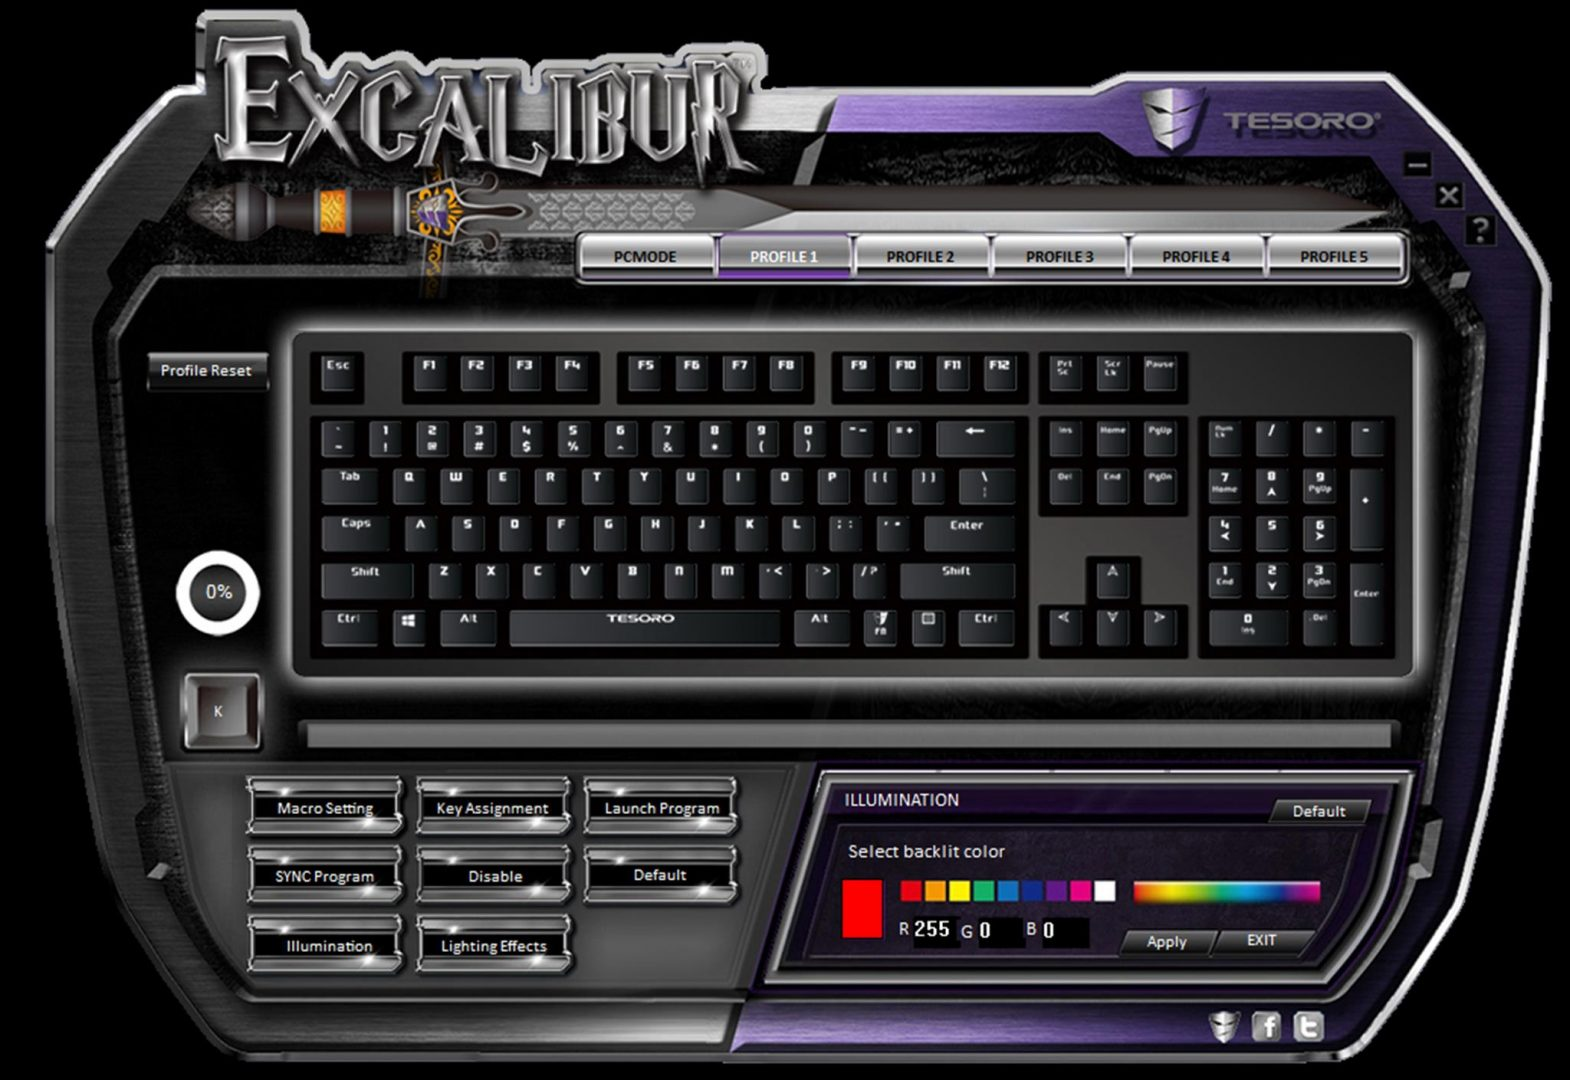 tesoro excalibur spectrum software 3